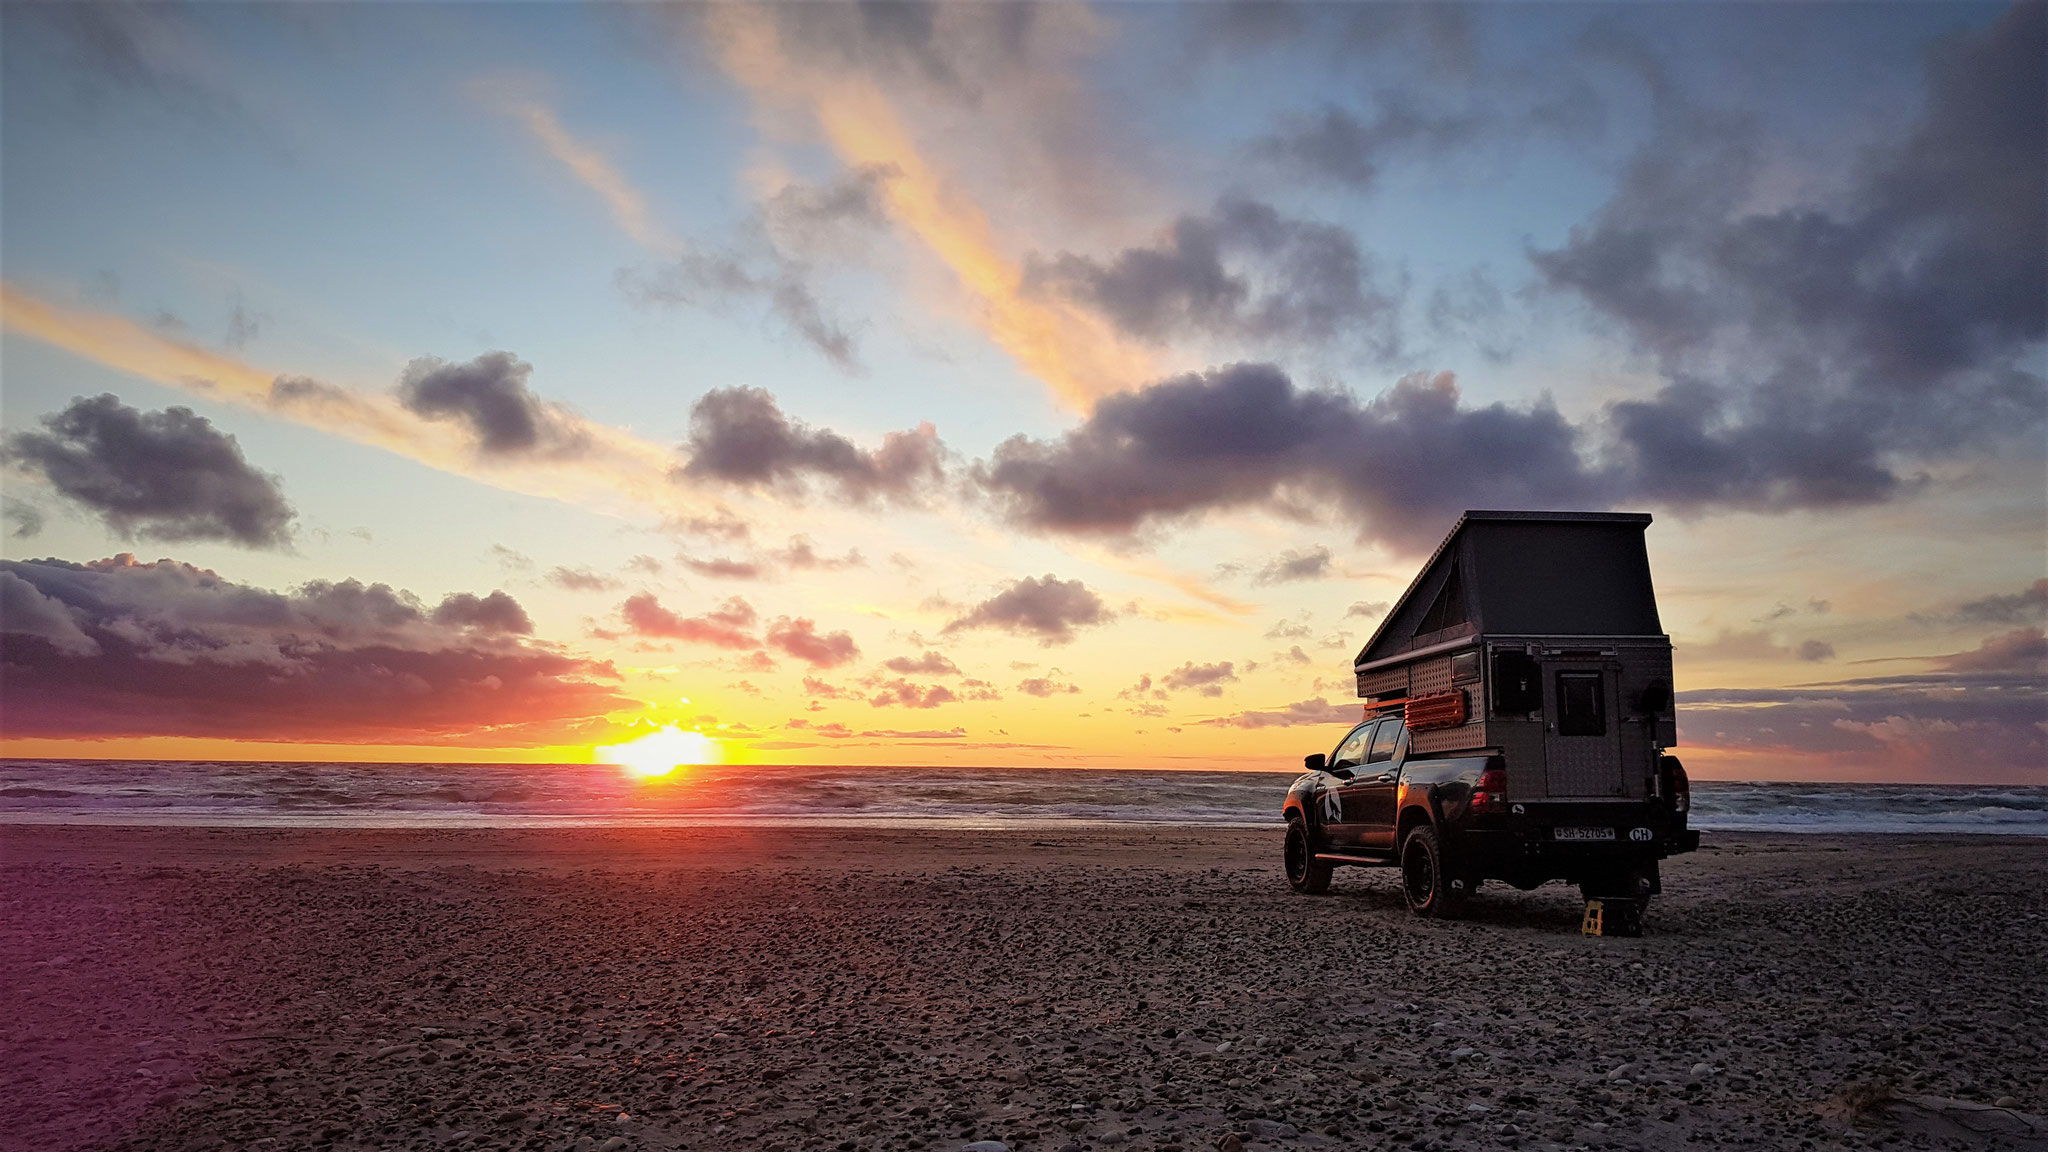 EXKAB Wohnkabine Toyota Hilux arctic trucks At33 At35 traveloverland truck Revo N80 #ProjektBlackwolf offroad Pick up camper Drive Your own Way AFN4x4Rival4x4 bfgoodrich t/a ko2 285/70R17 ltprtz DL0011-C Explore Without Limits #borntoroam Beach